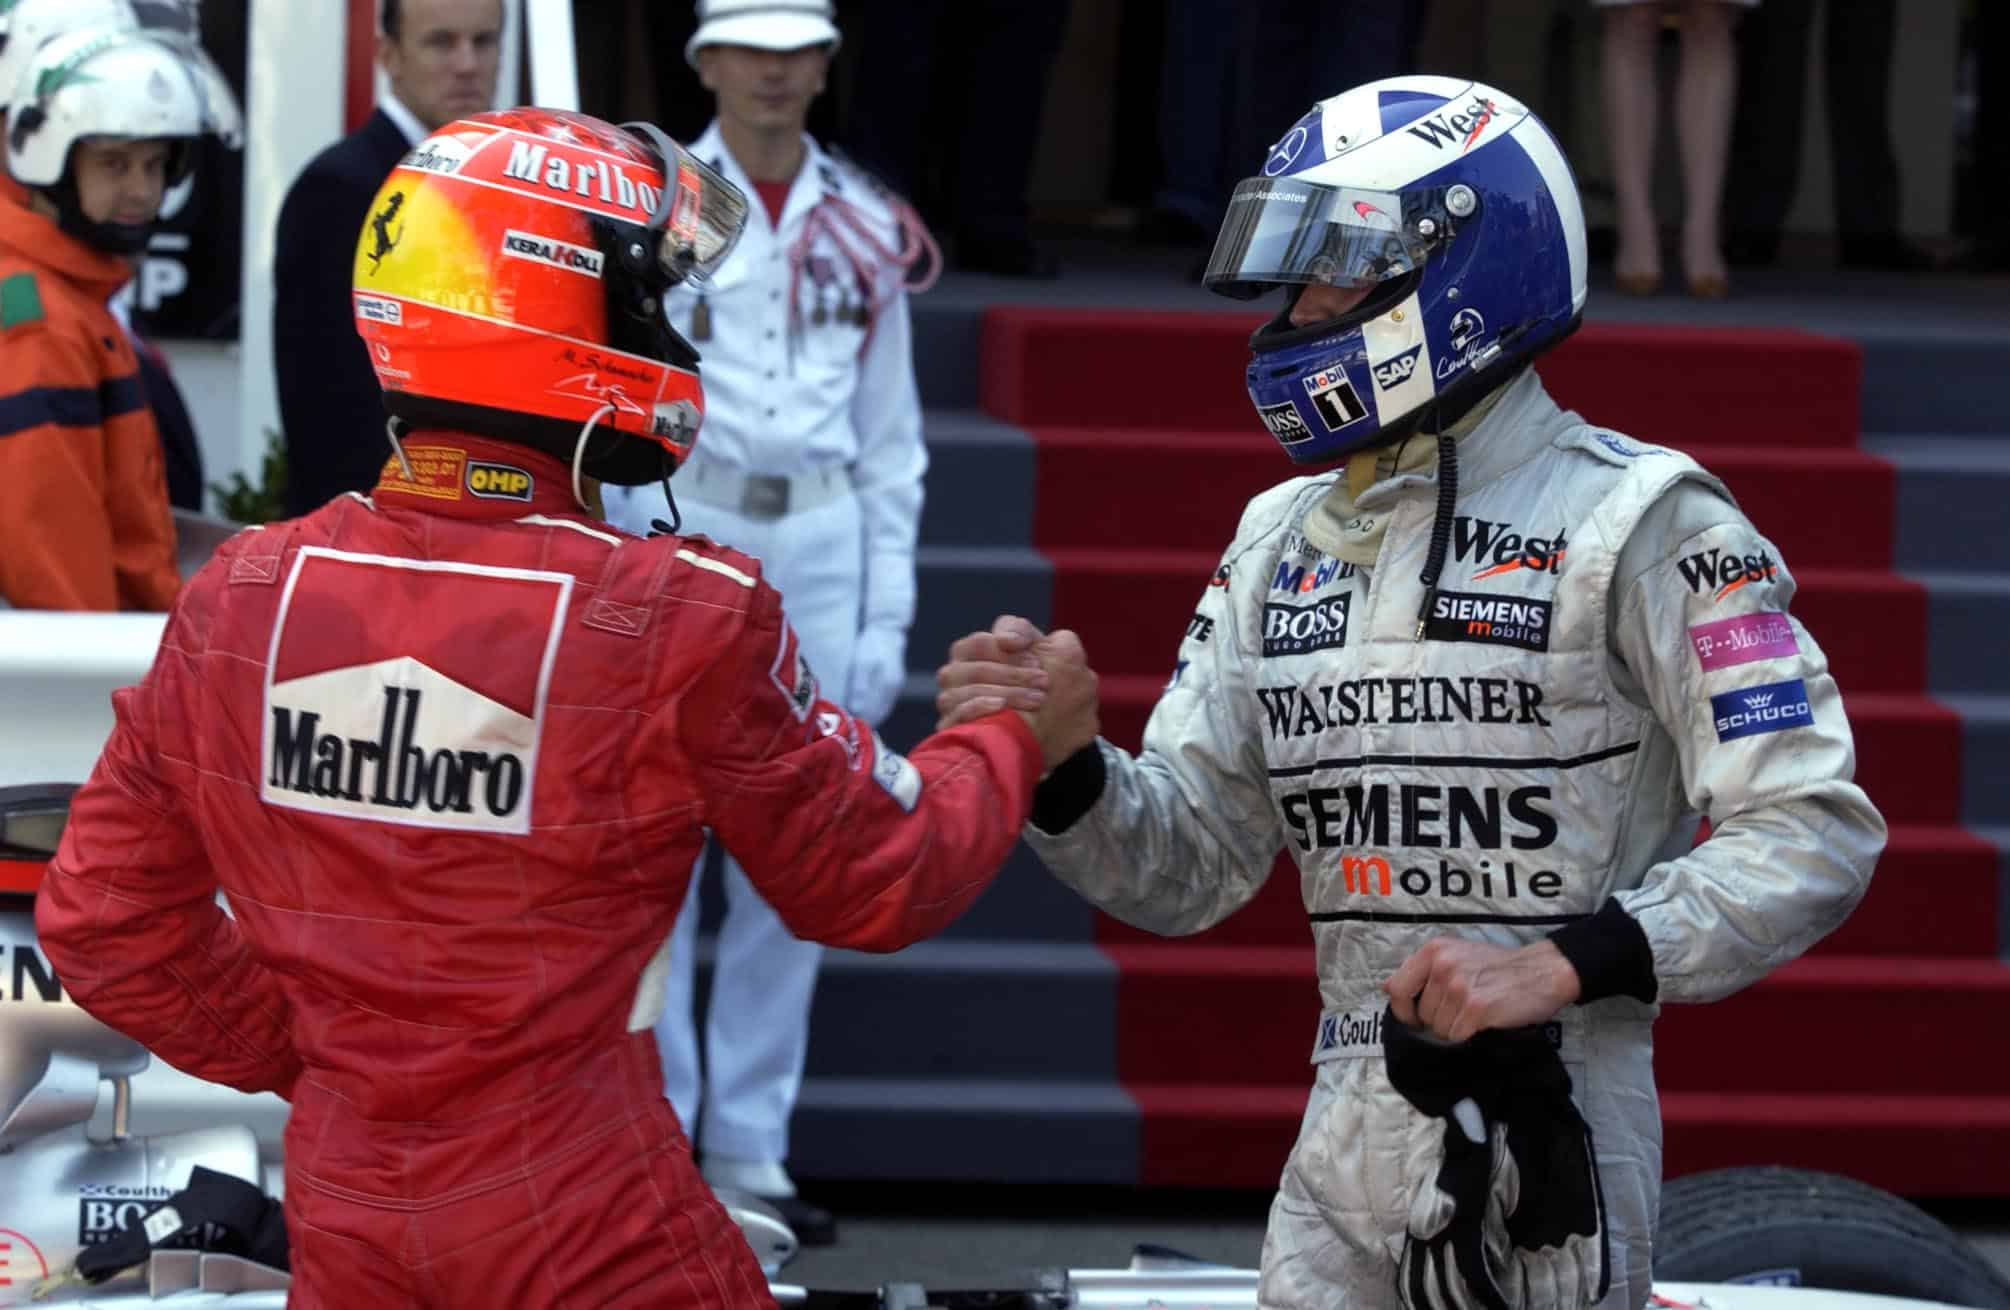 Monaco GP F1 2002 Schumacher Coulthard after the race Photo Ferrari